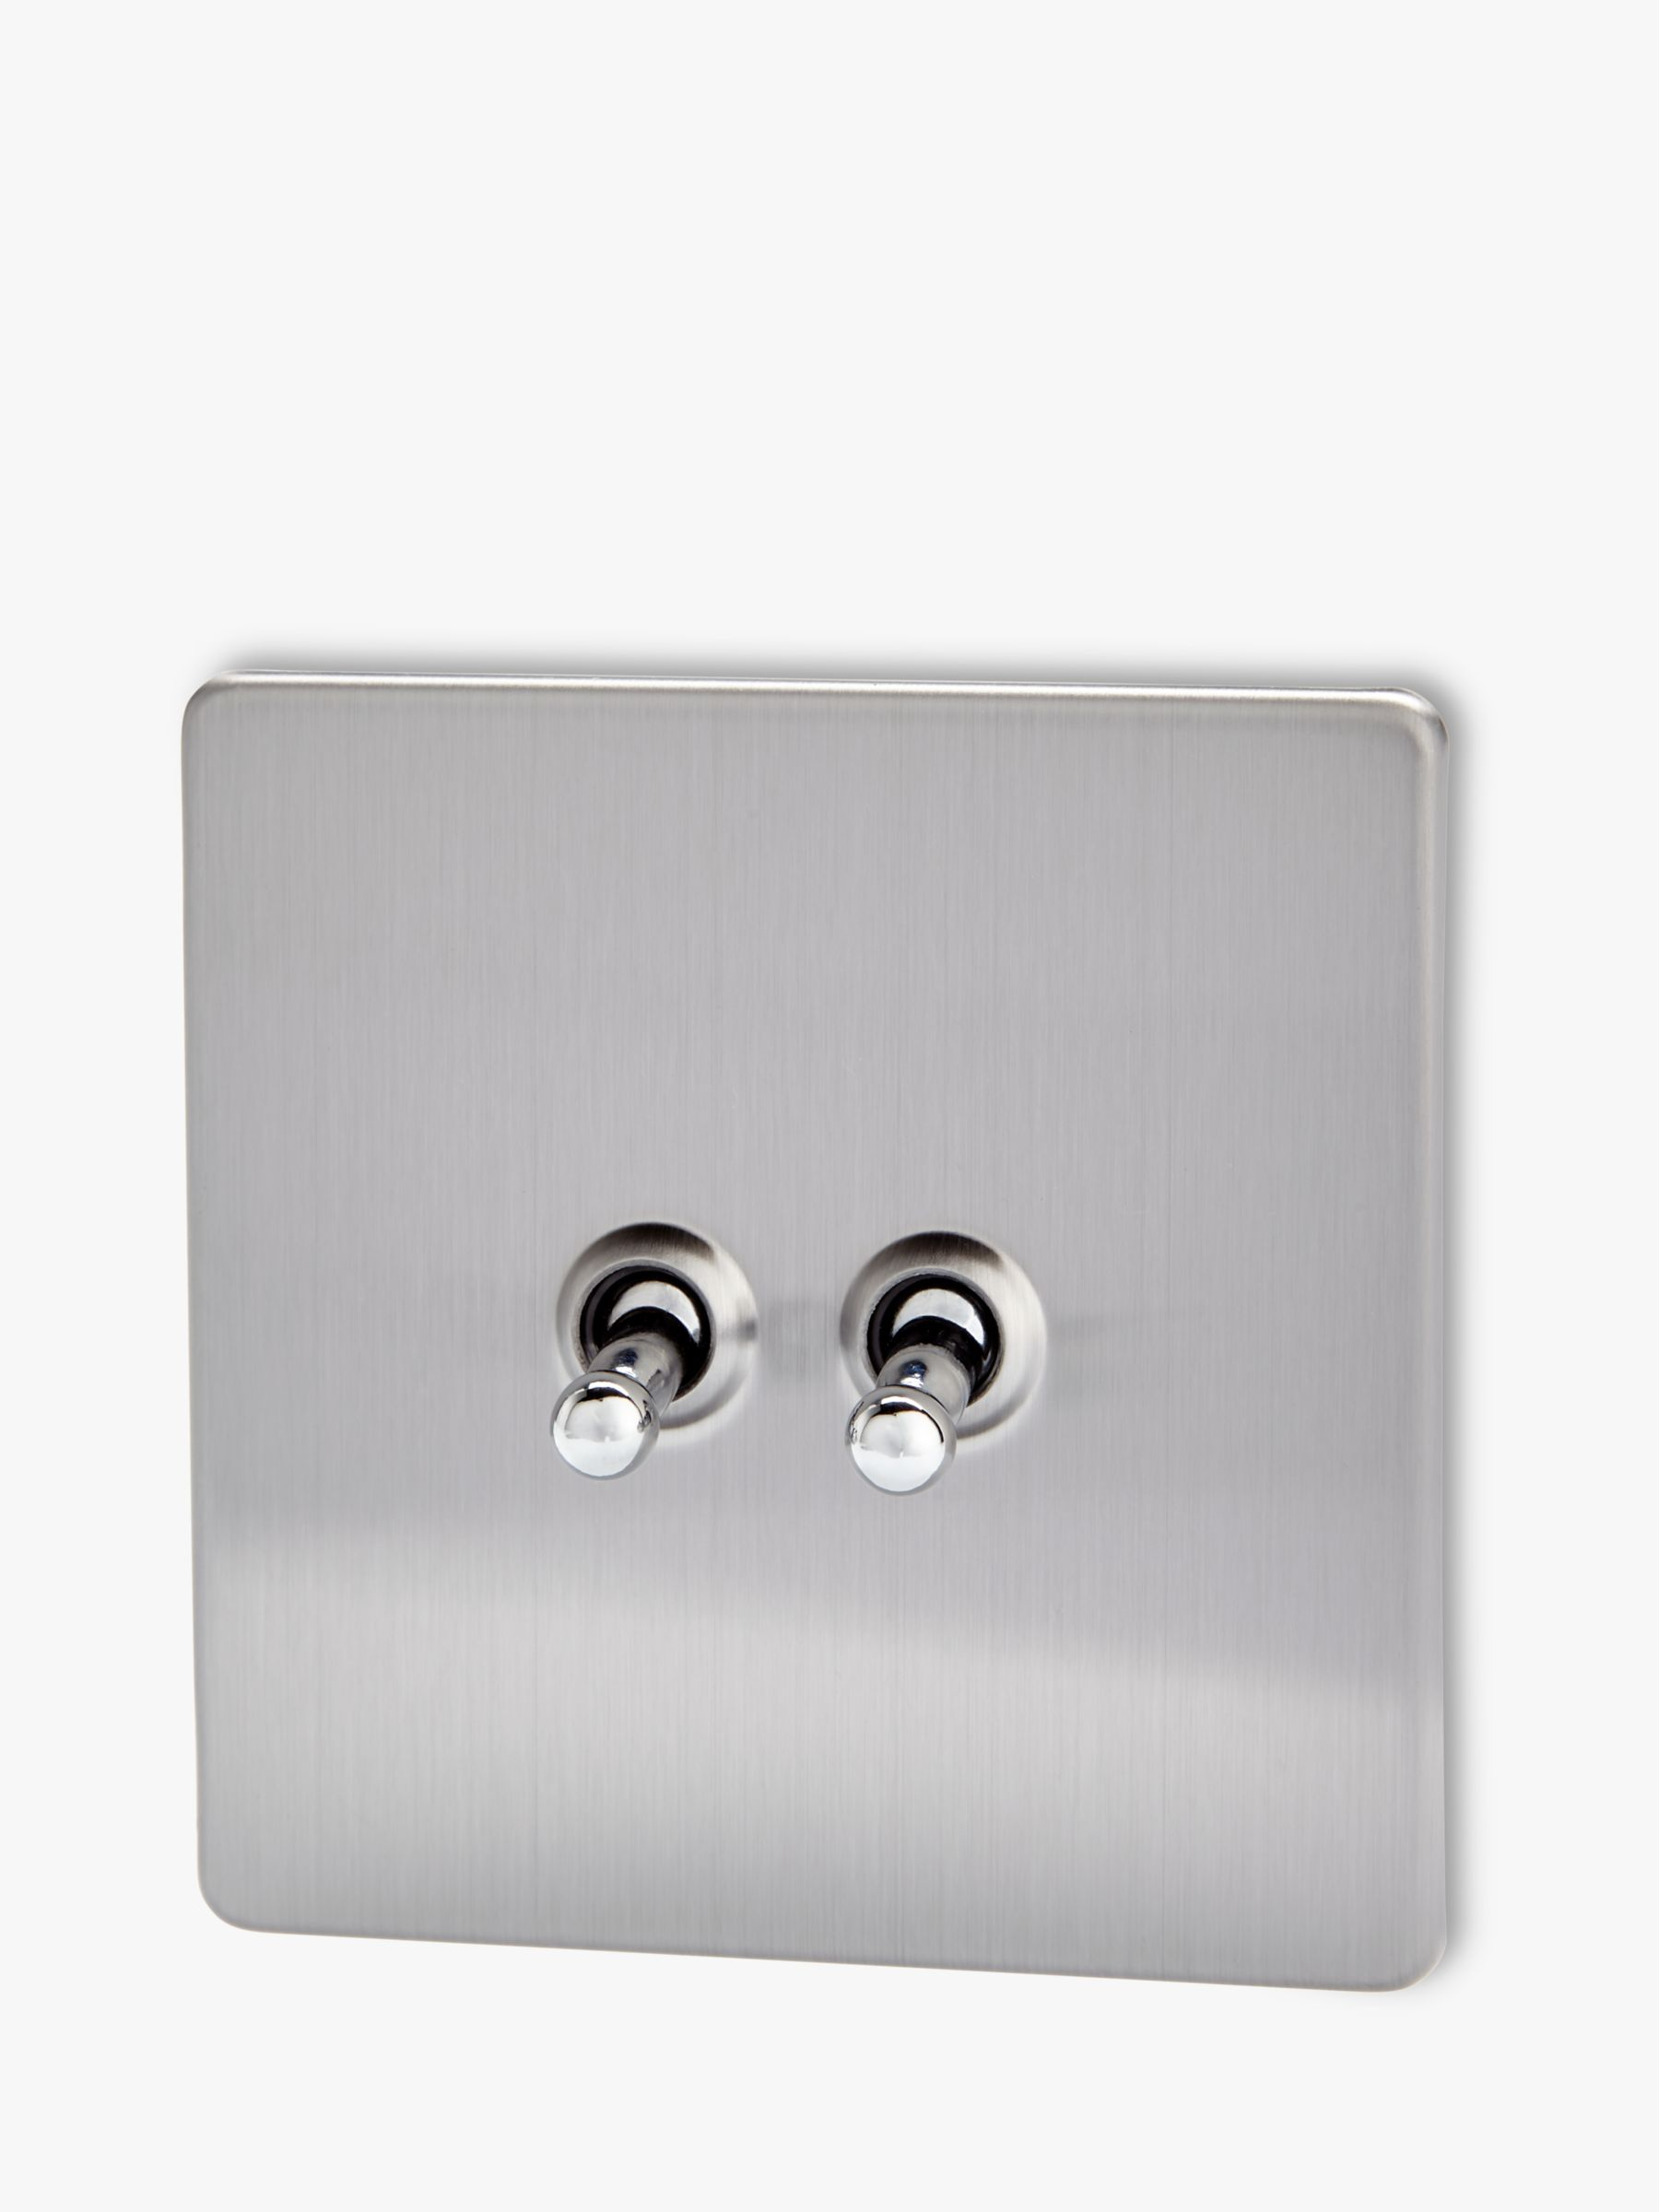 Varilight Varilight 2 Gang 2-Way Toggle Switch, Brushed Steel